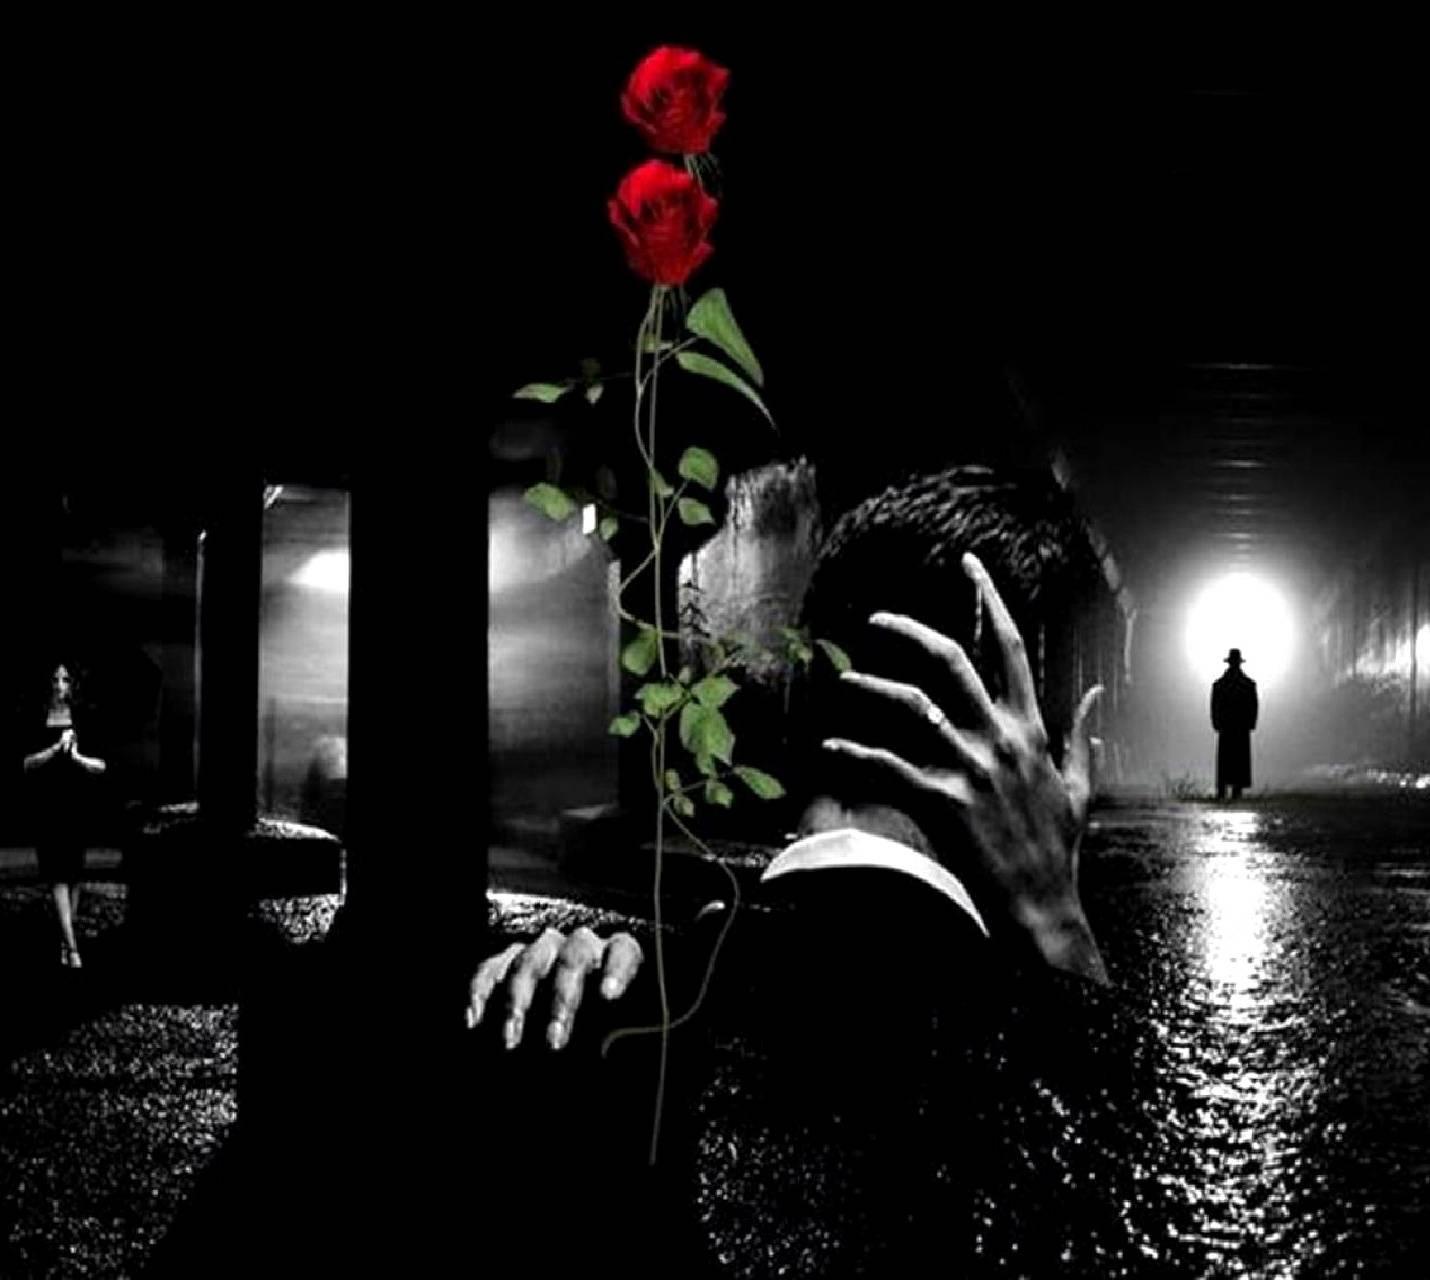 stranger in  night